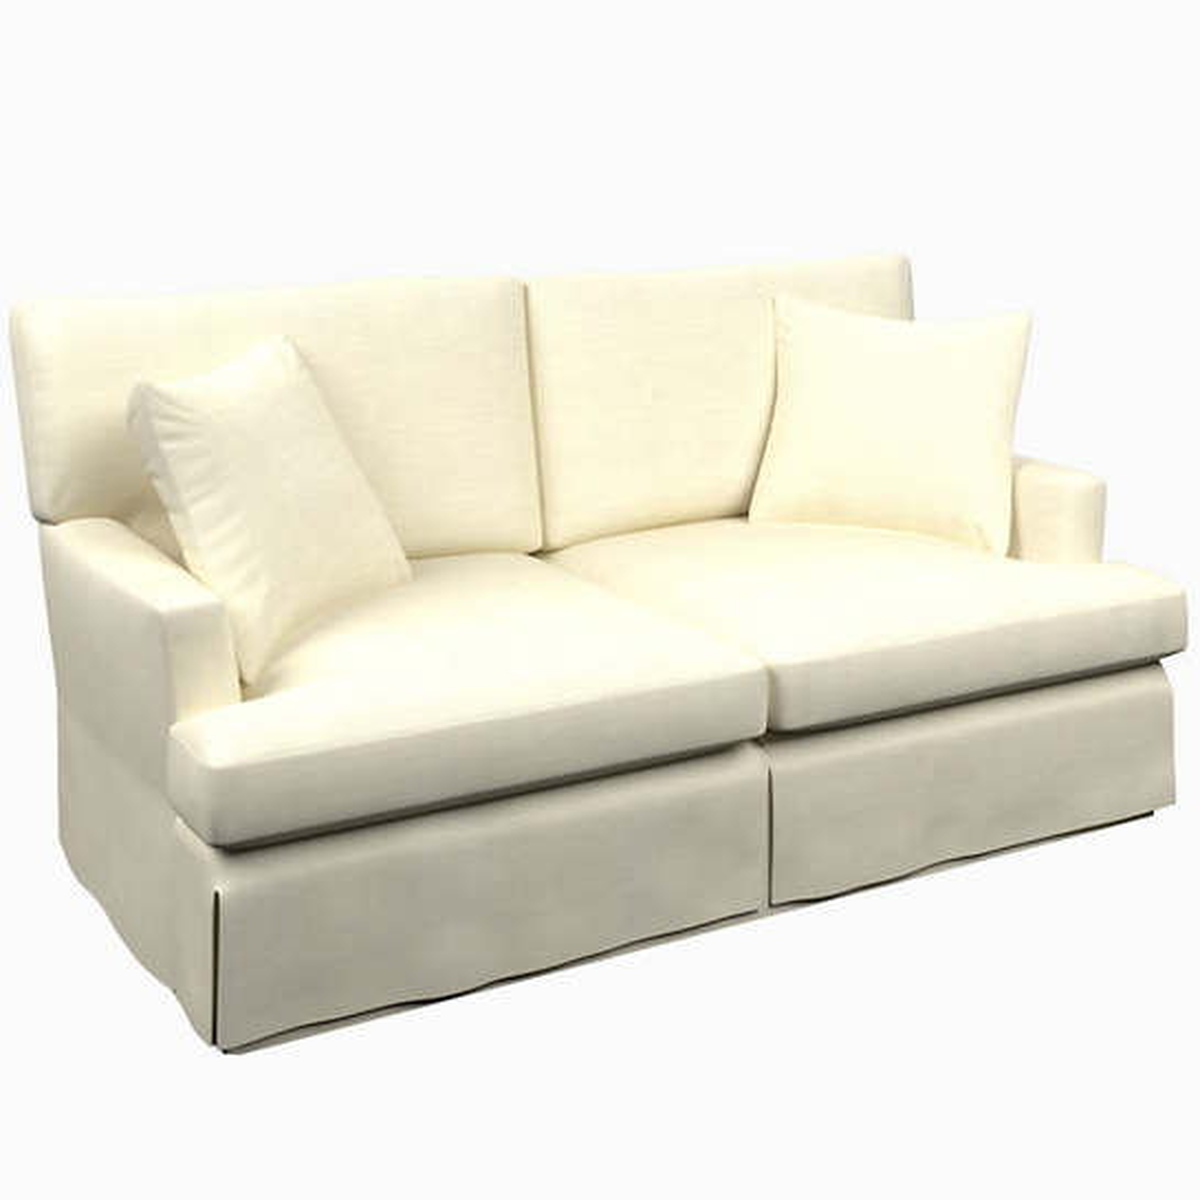 Estate Linen Ivory Saybrook 2 Seater Slipcovered Sofa